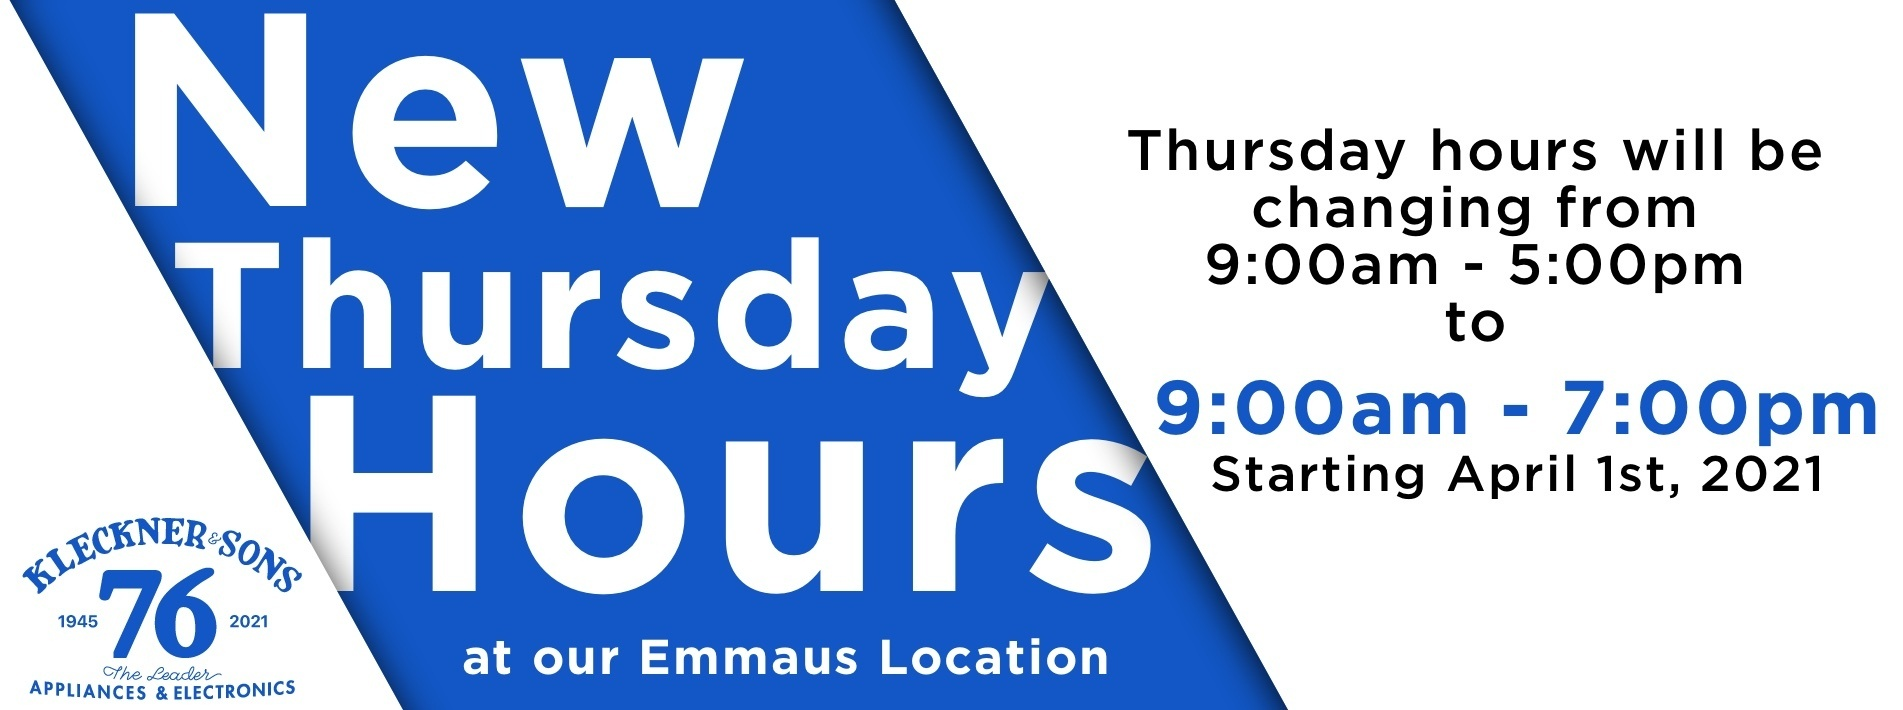 New Hours: Emmaus Location 3